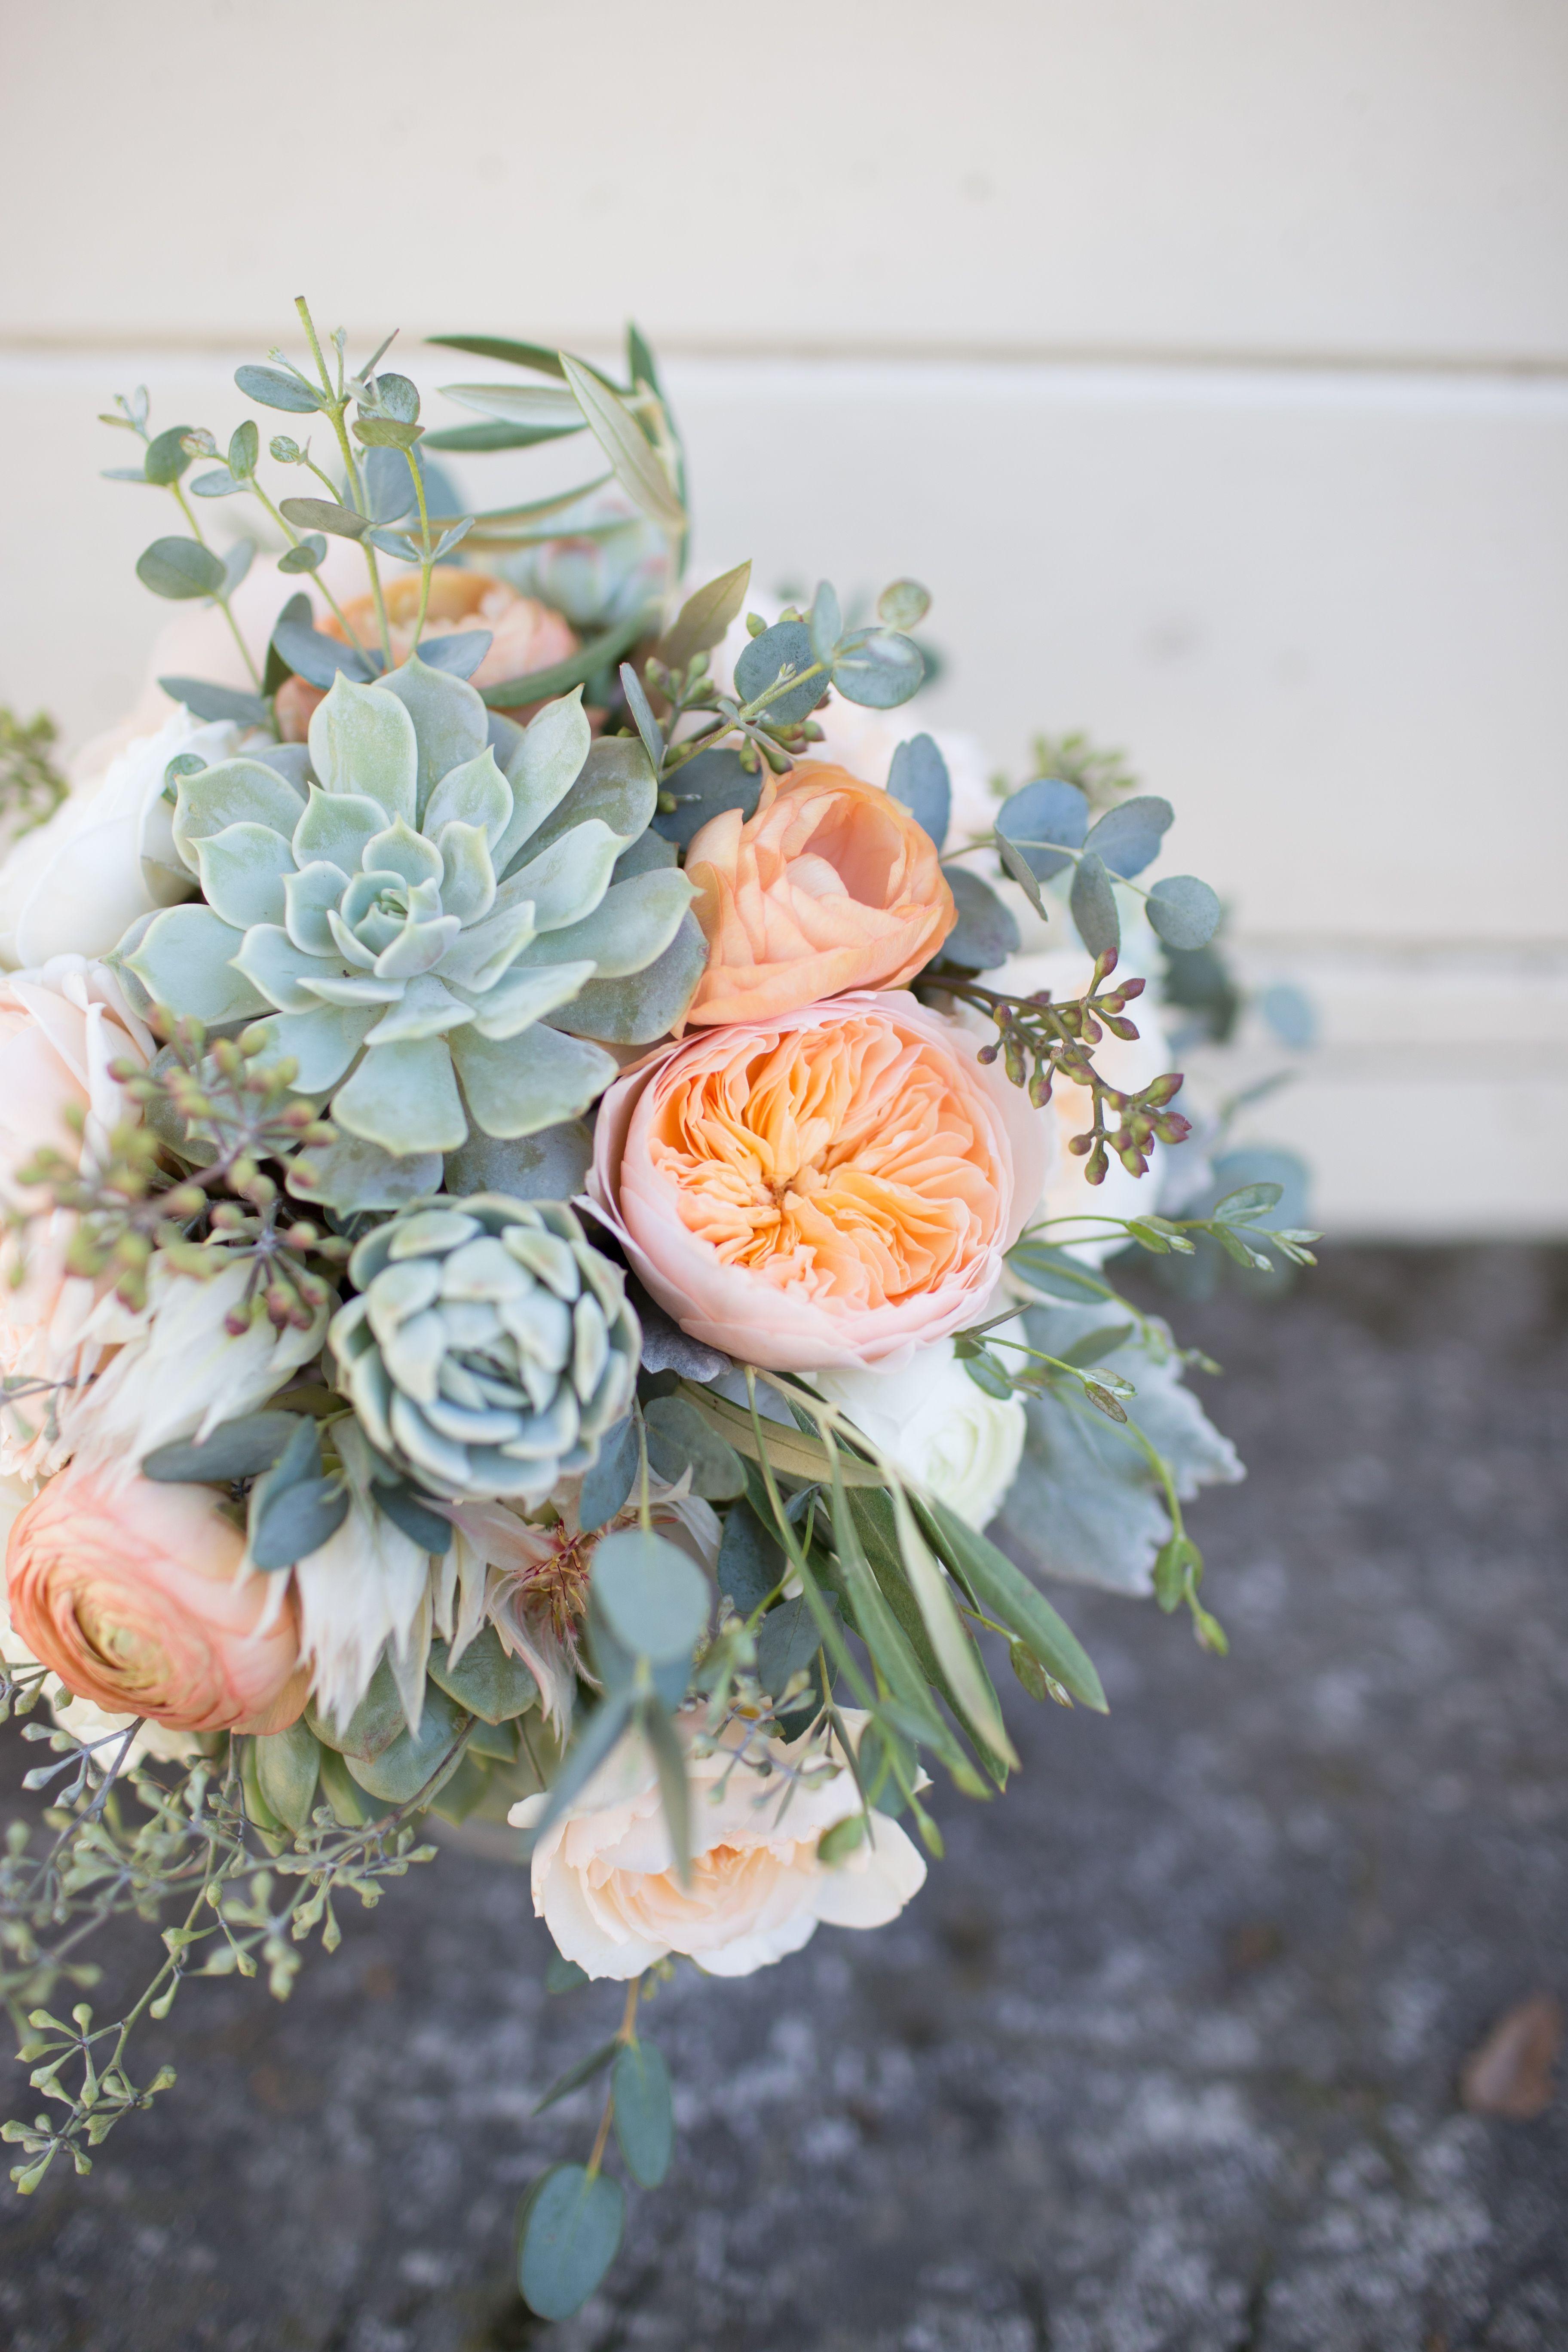 Peach juliet garden rose and sage green succulent and